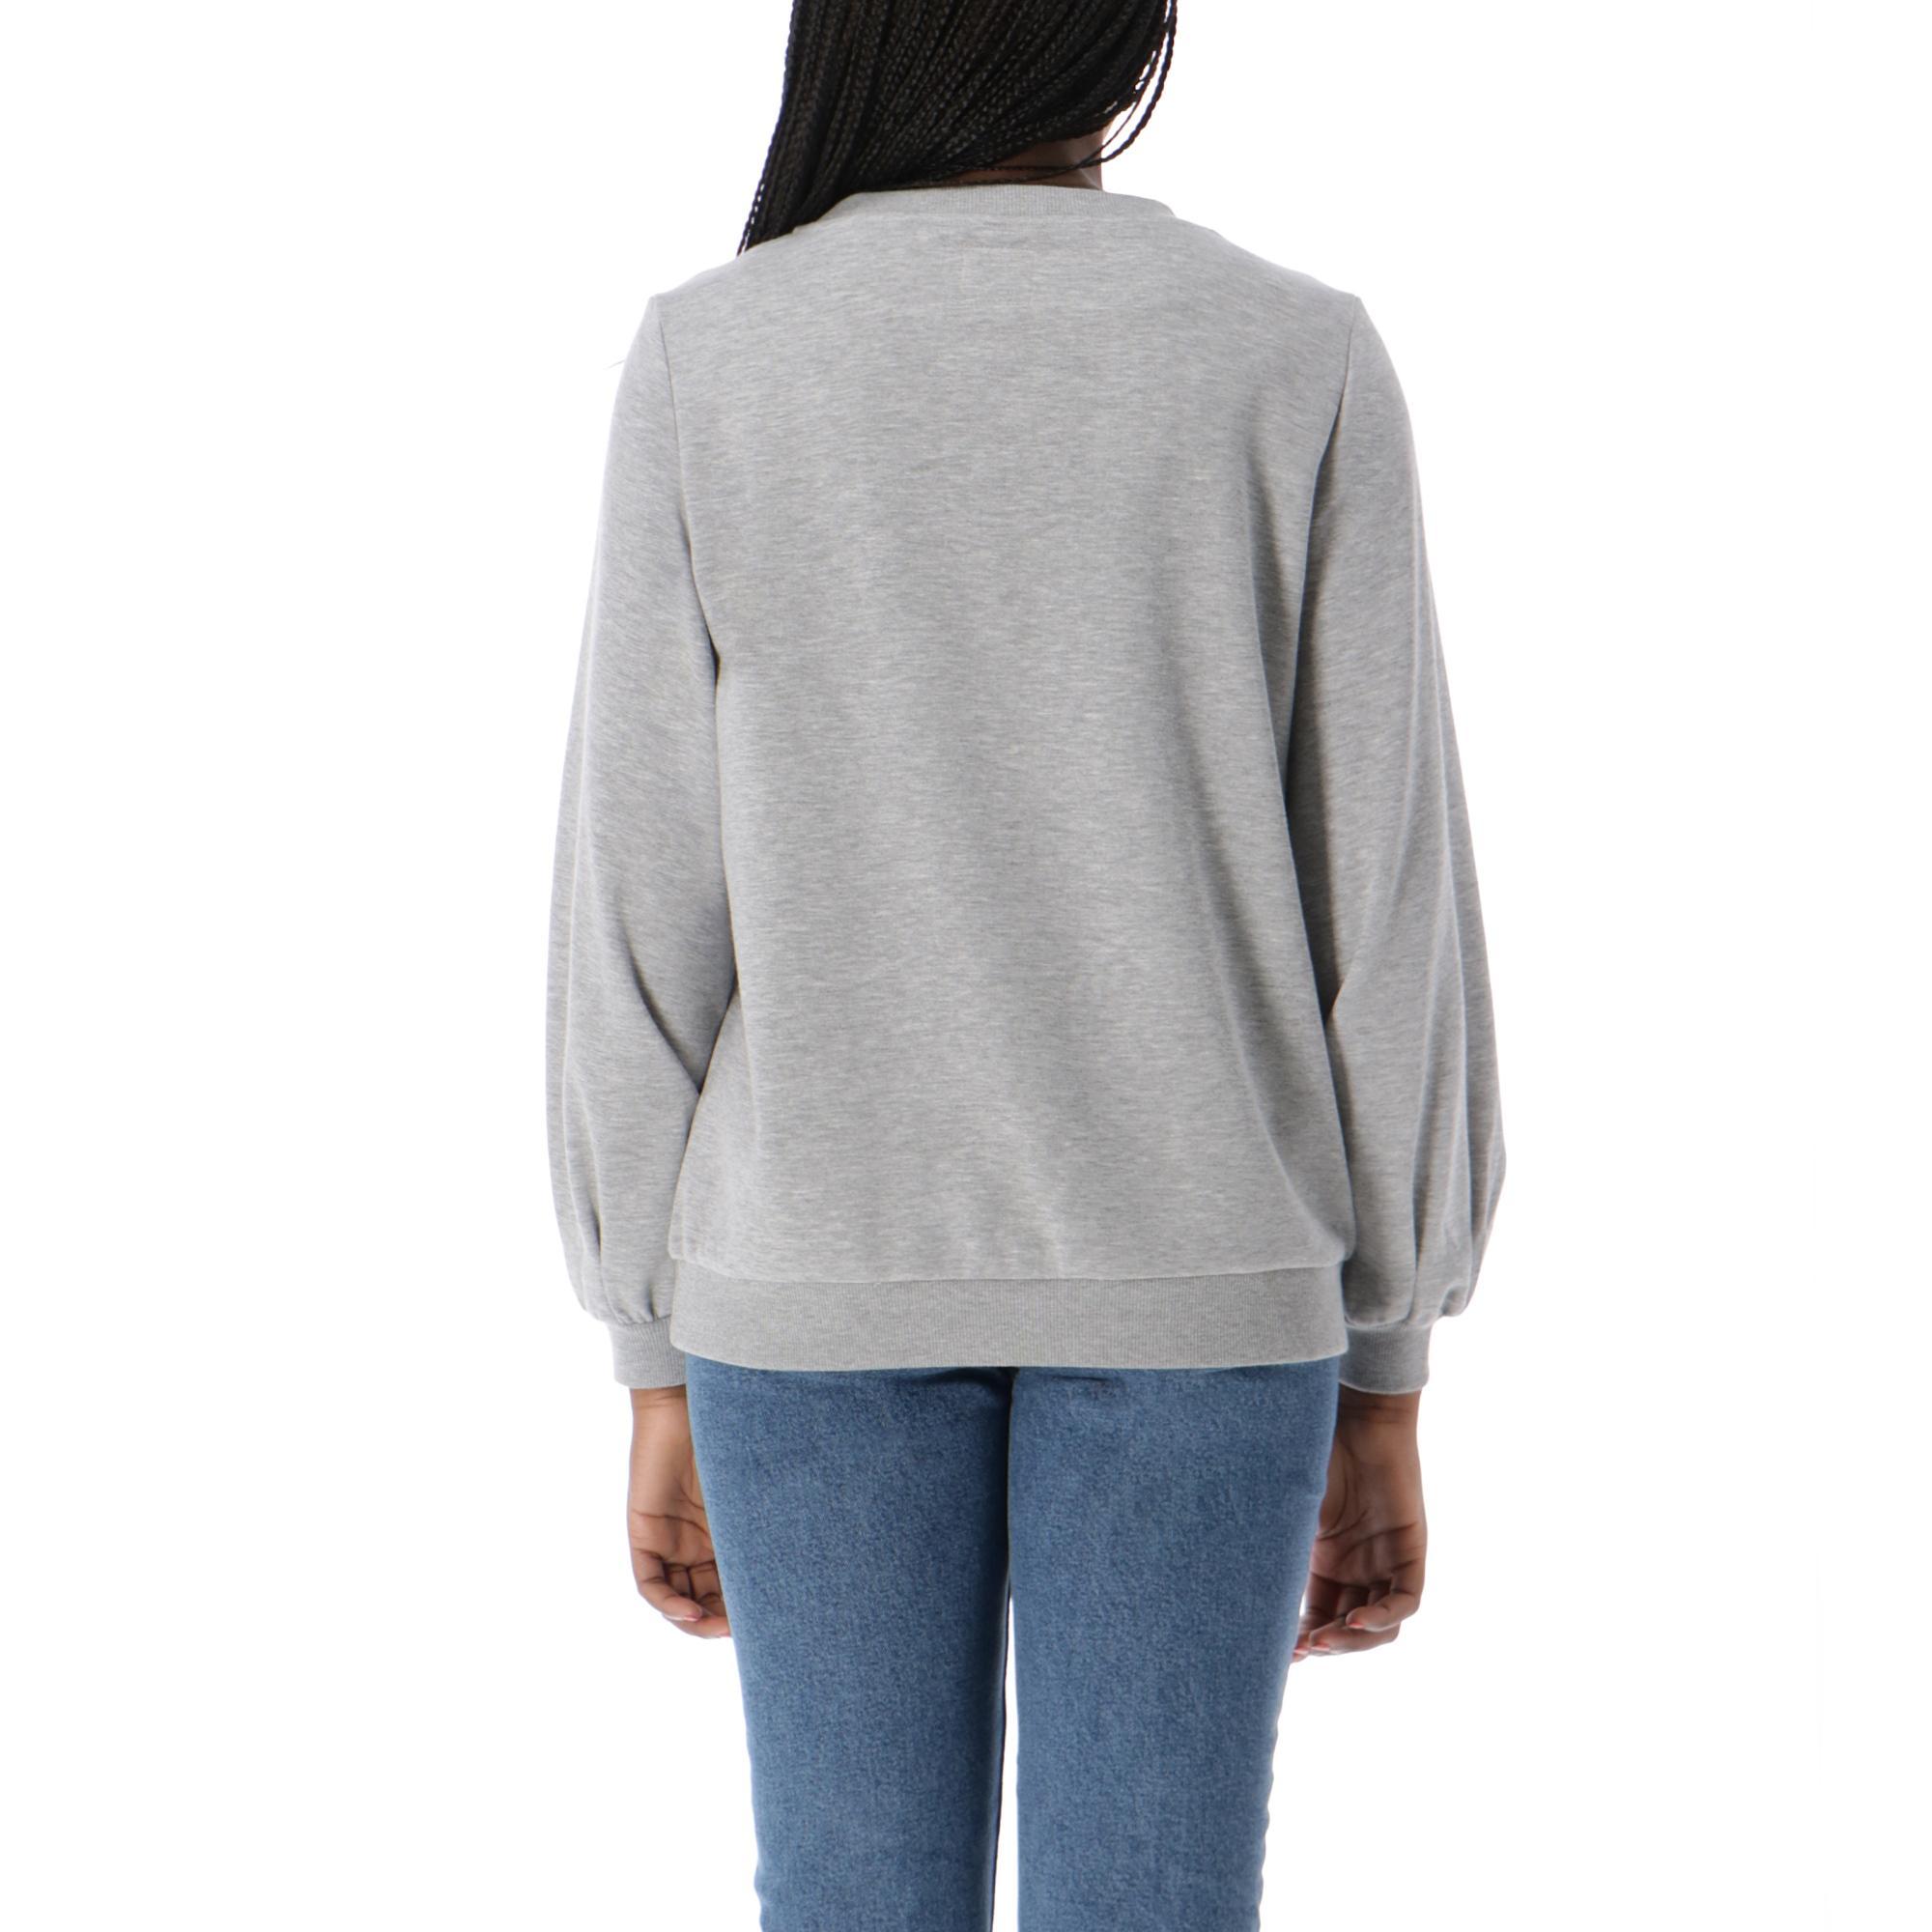 8fce80e02c91 Only Mickey O-neck Sweatshirt Light Grey Melange | Treesse